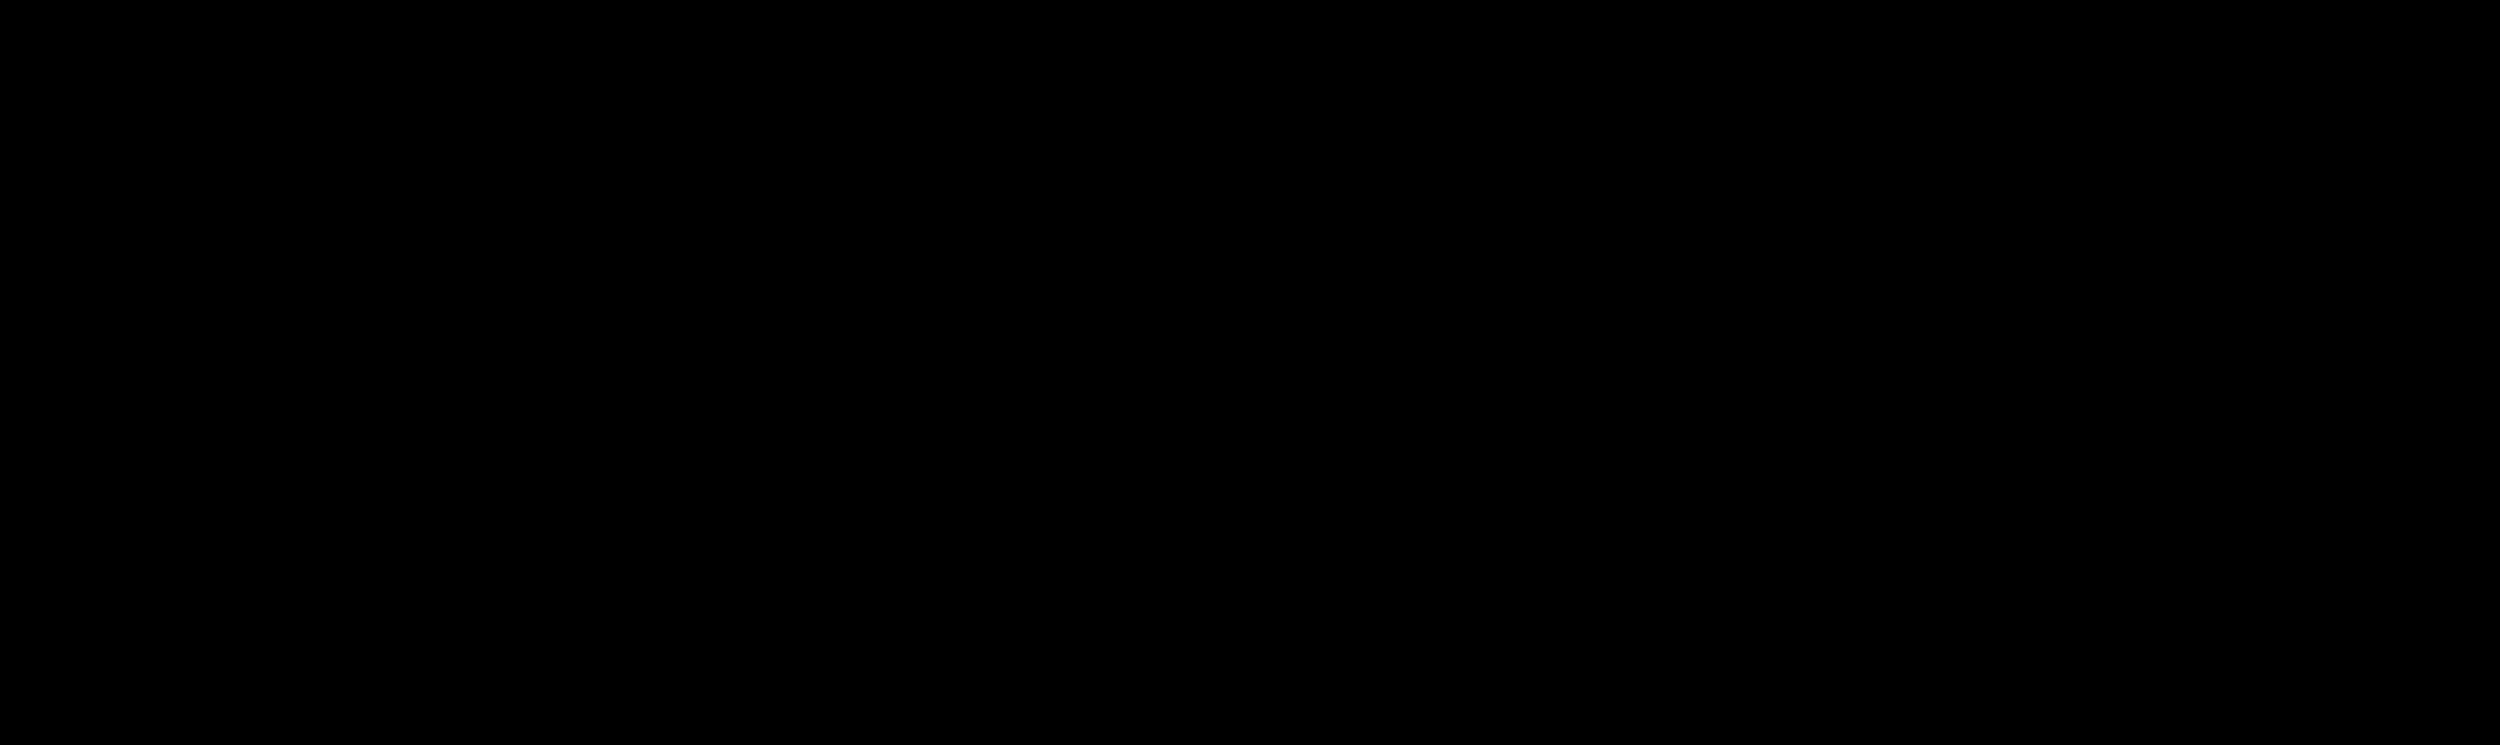 Oxbow Wordmark Black copy.png